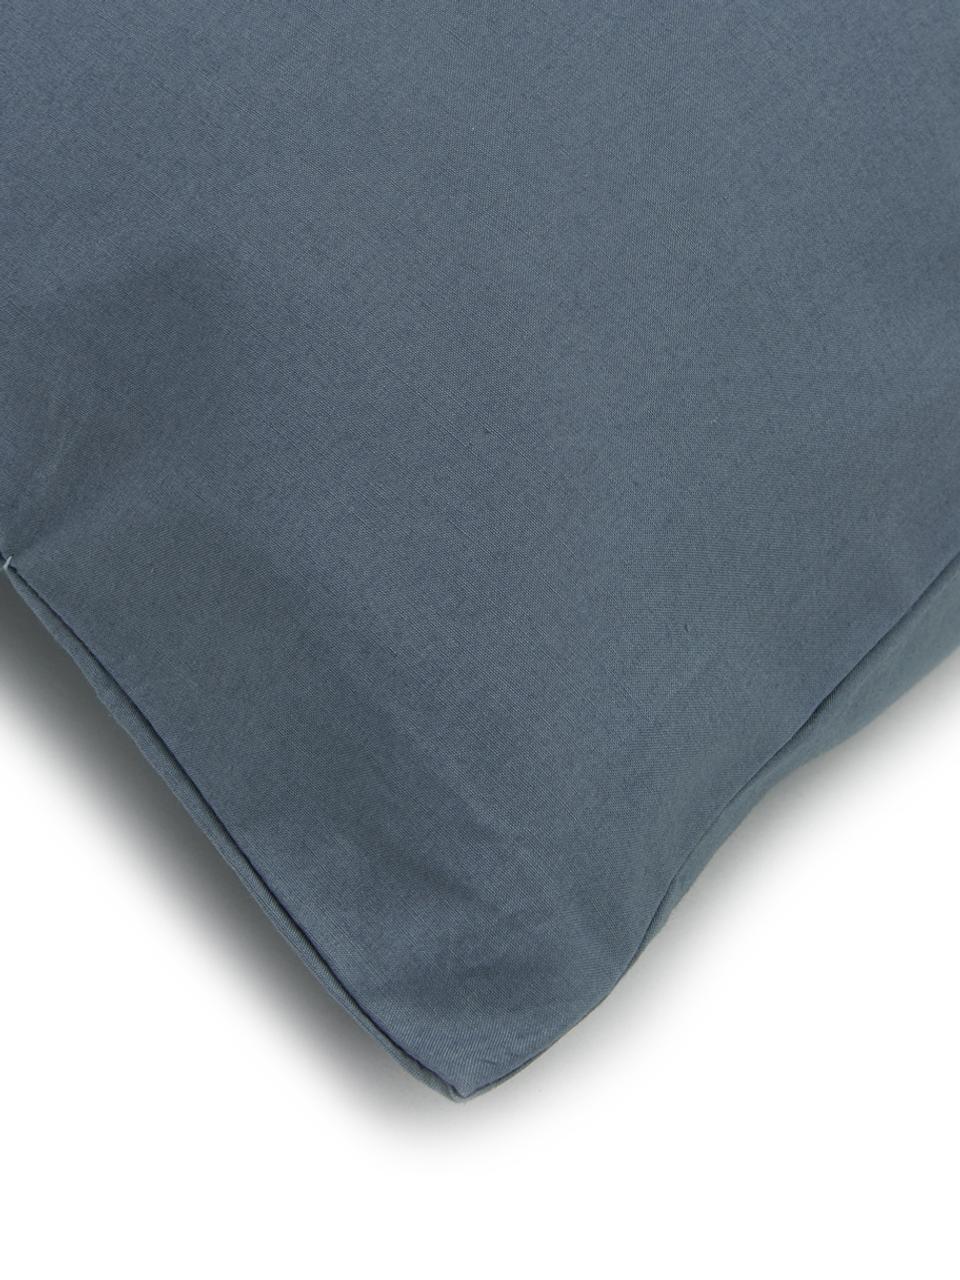 Baumwollperkal-Bettwäsche Elsie in Blau, Webart: Perkal Fadendichte 200 TC, Blau, 240 x 220 cm + 2 Kissen 80 x 80 cm